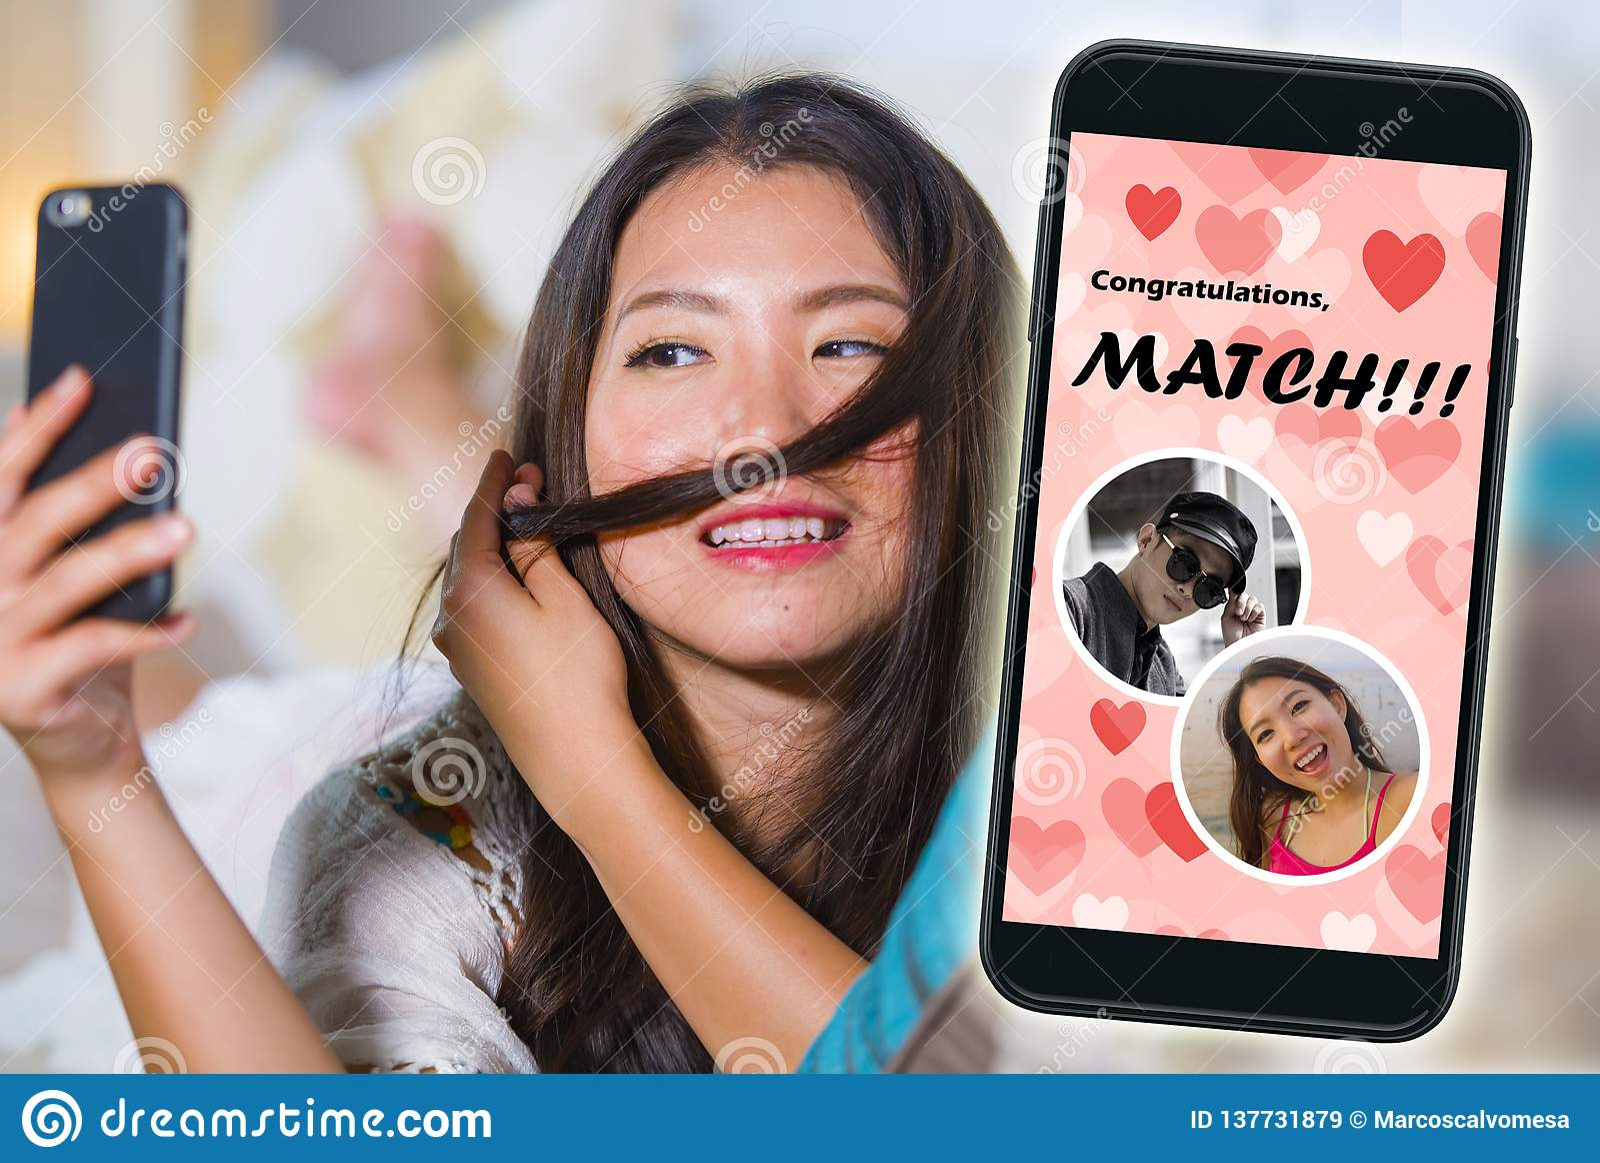 genuine cougar dating sites Brumadinho